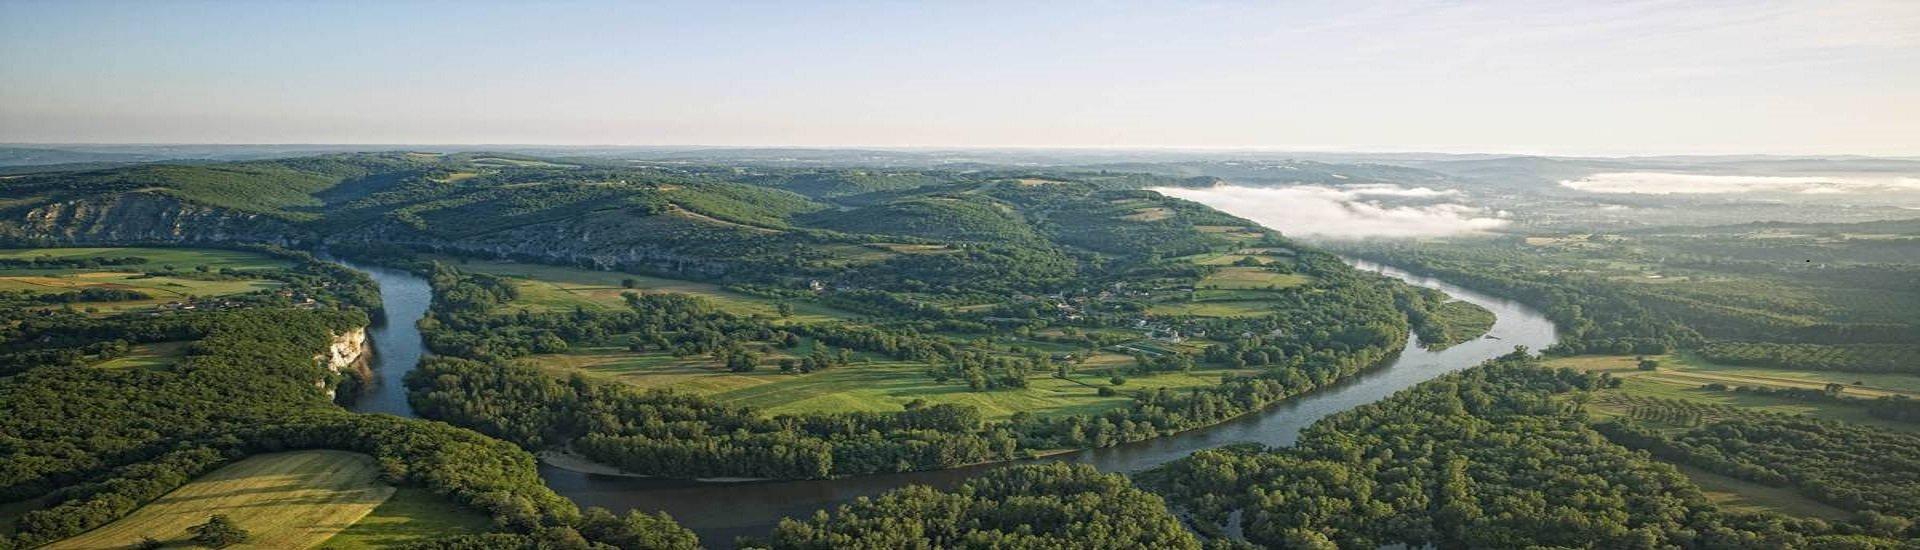 De prachtige Dordogne regio